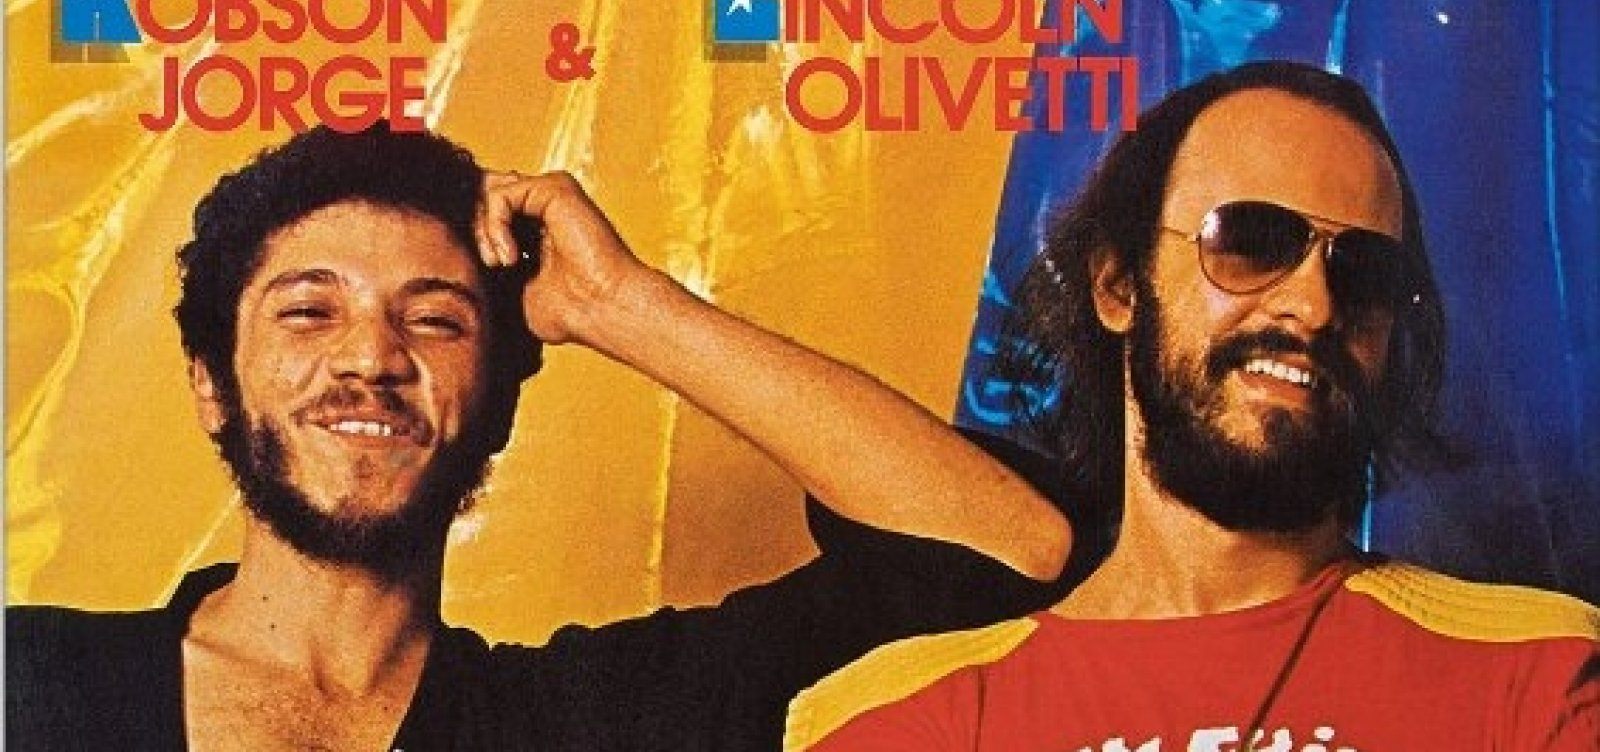 [Robson Jorge & Lincoln Olivetti: uma aula de música pop]